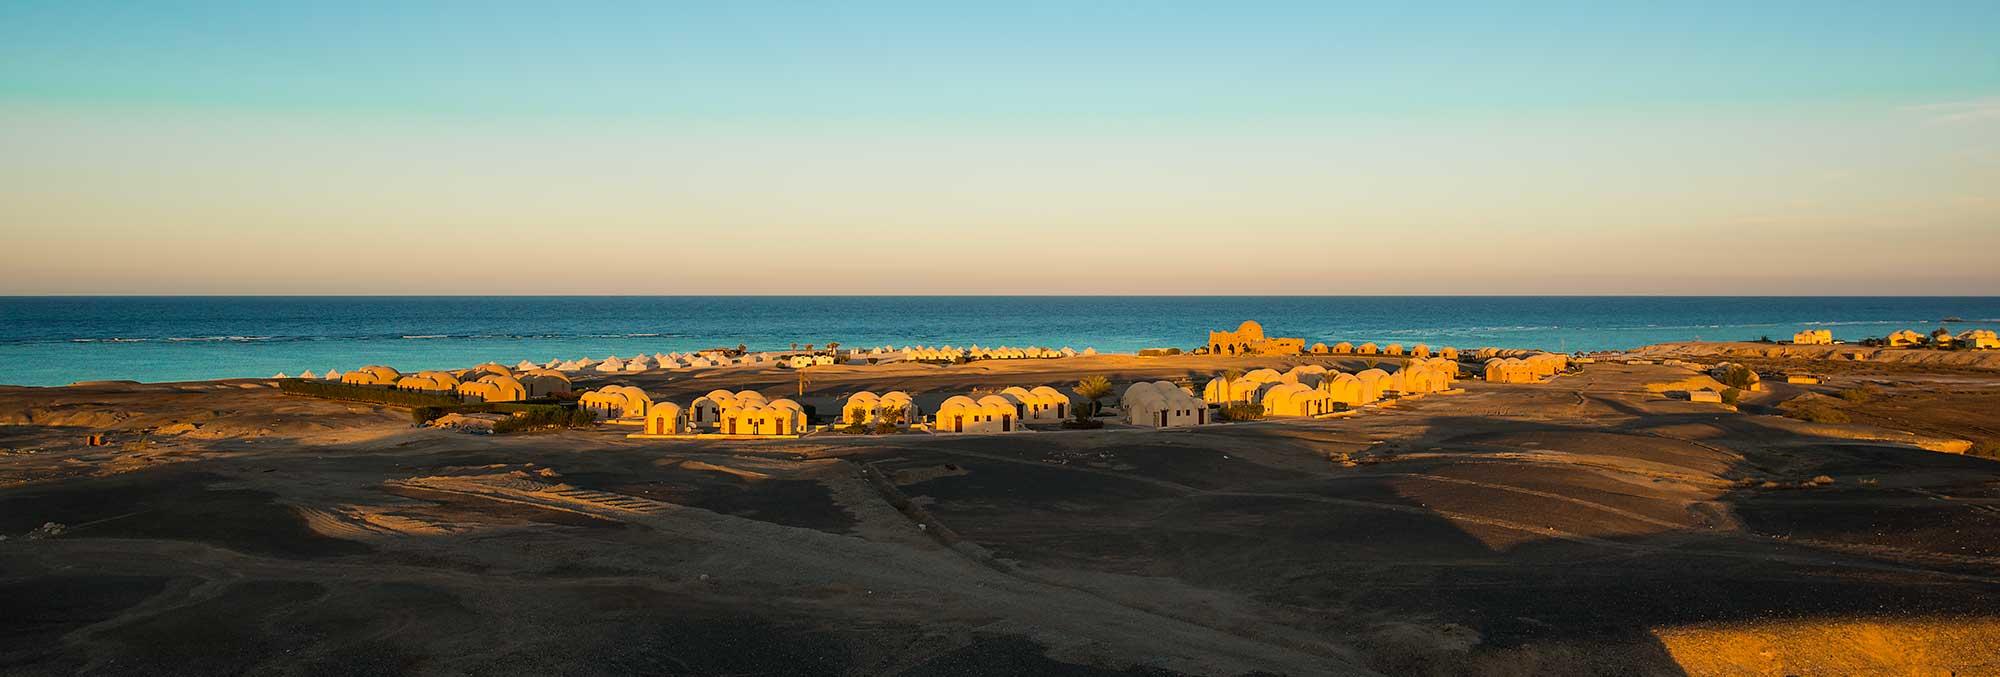 Marsa Shagra Dive Camp, southern Red Sea - Egypt